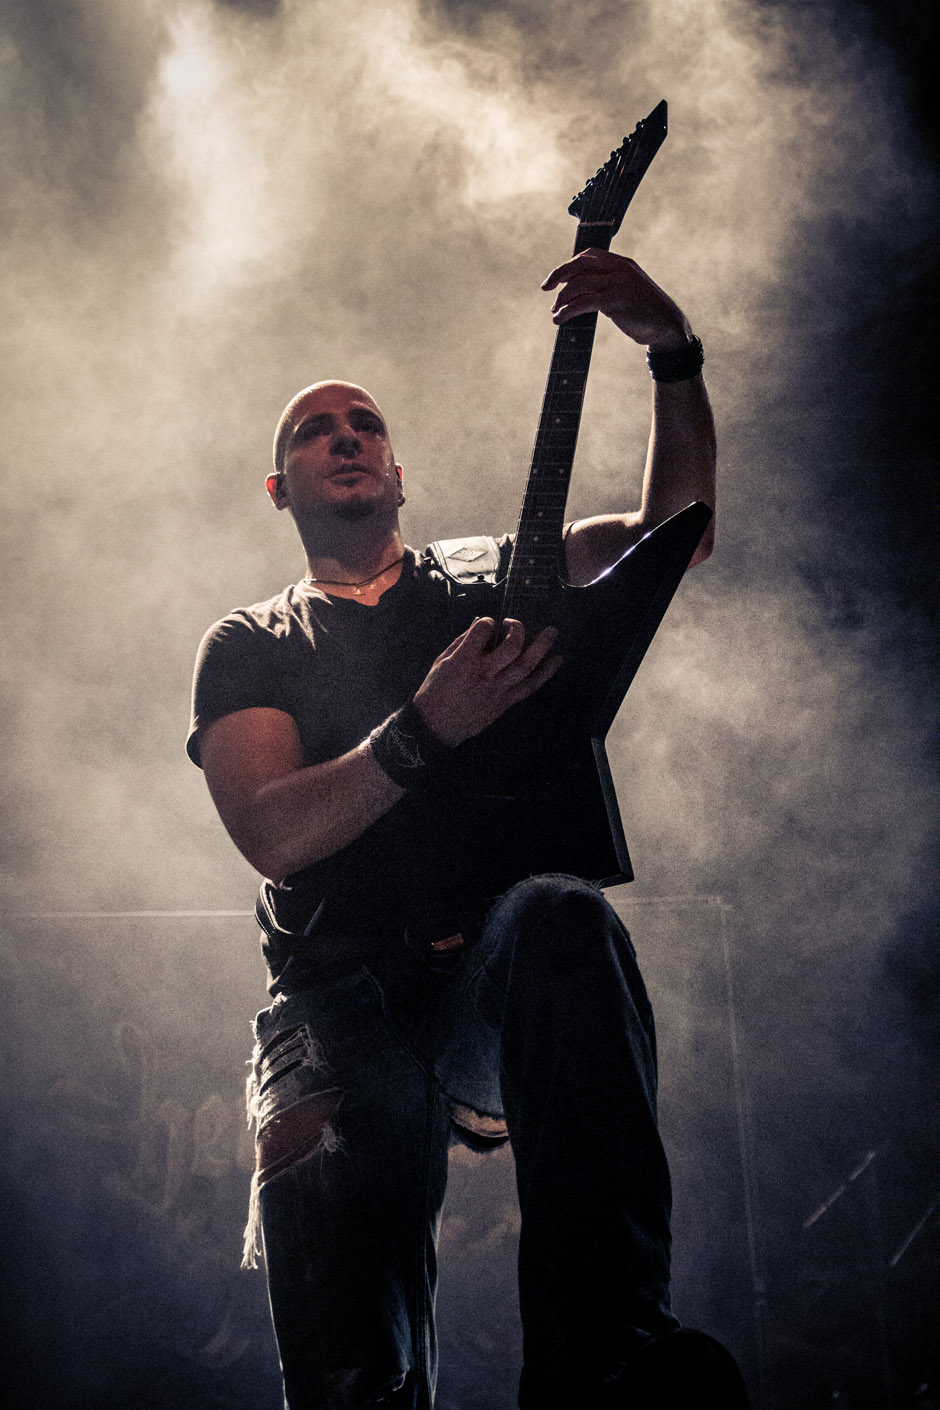 Equilibrium live, 05.10.2013, Heidenfest Oberhausen